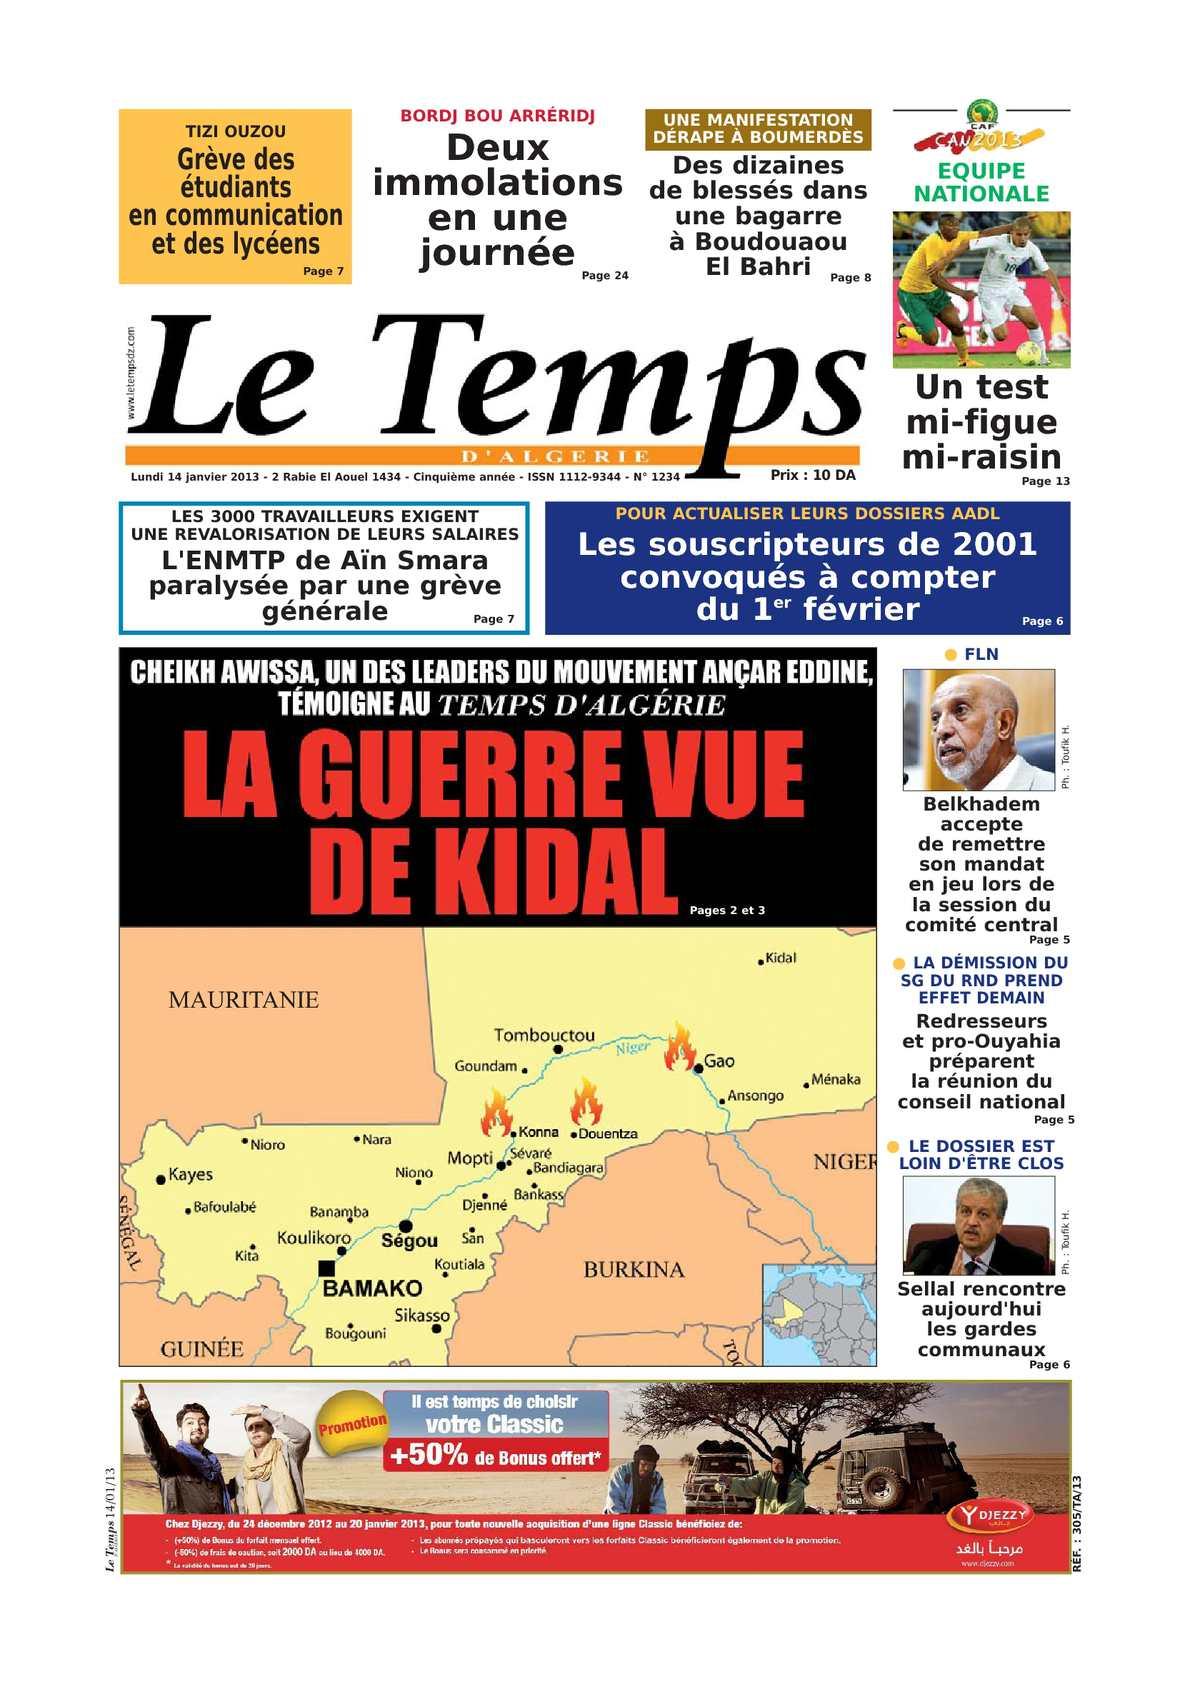 Pet Supplies Cooperative Oursin Mauritanie